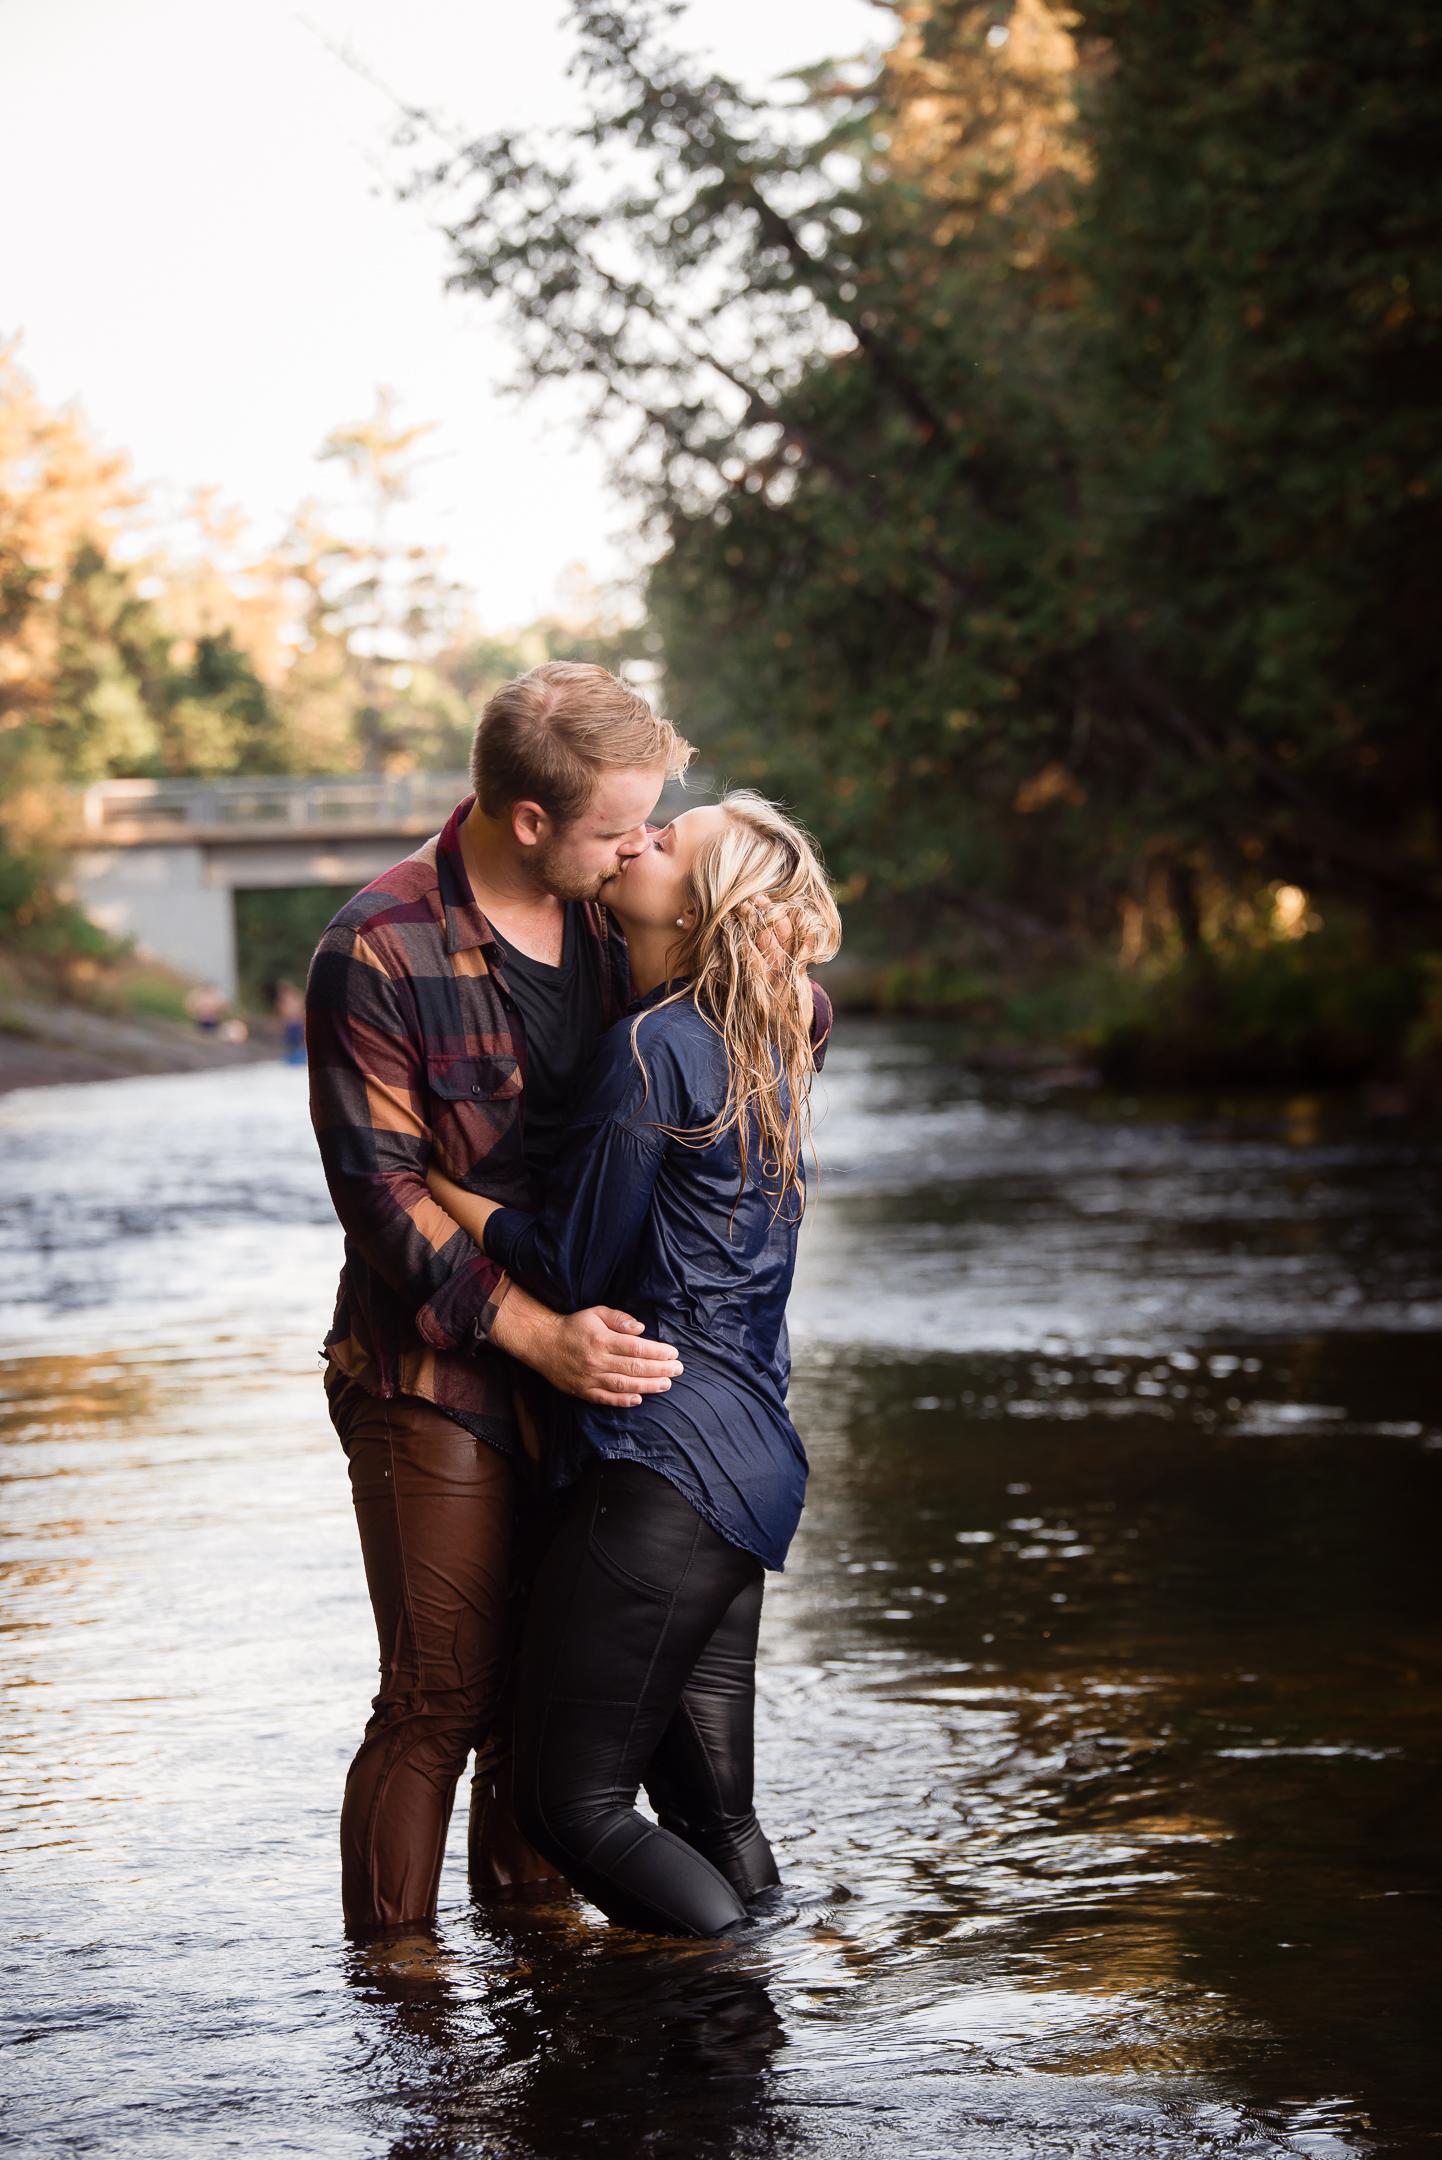 Naomi Lucienne Photography - Couples - 170923950.jpg